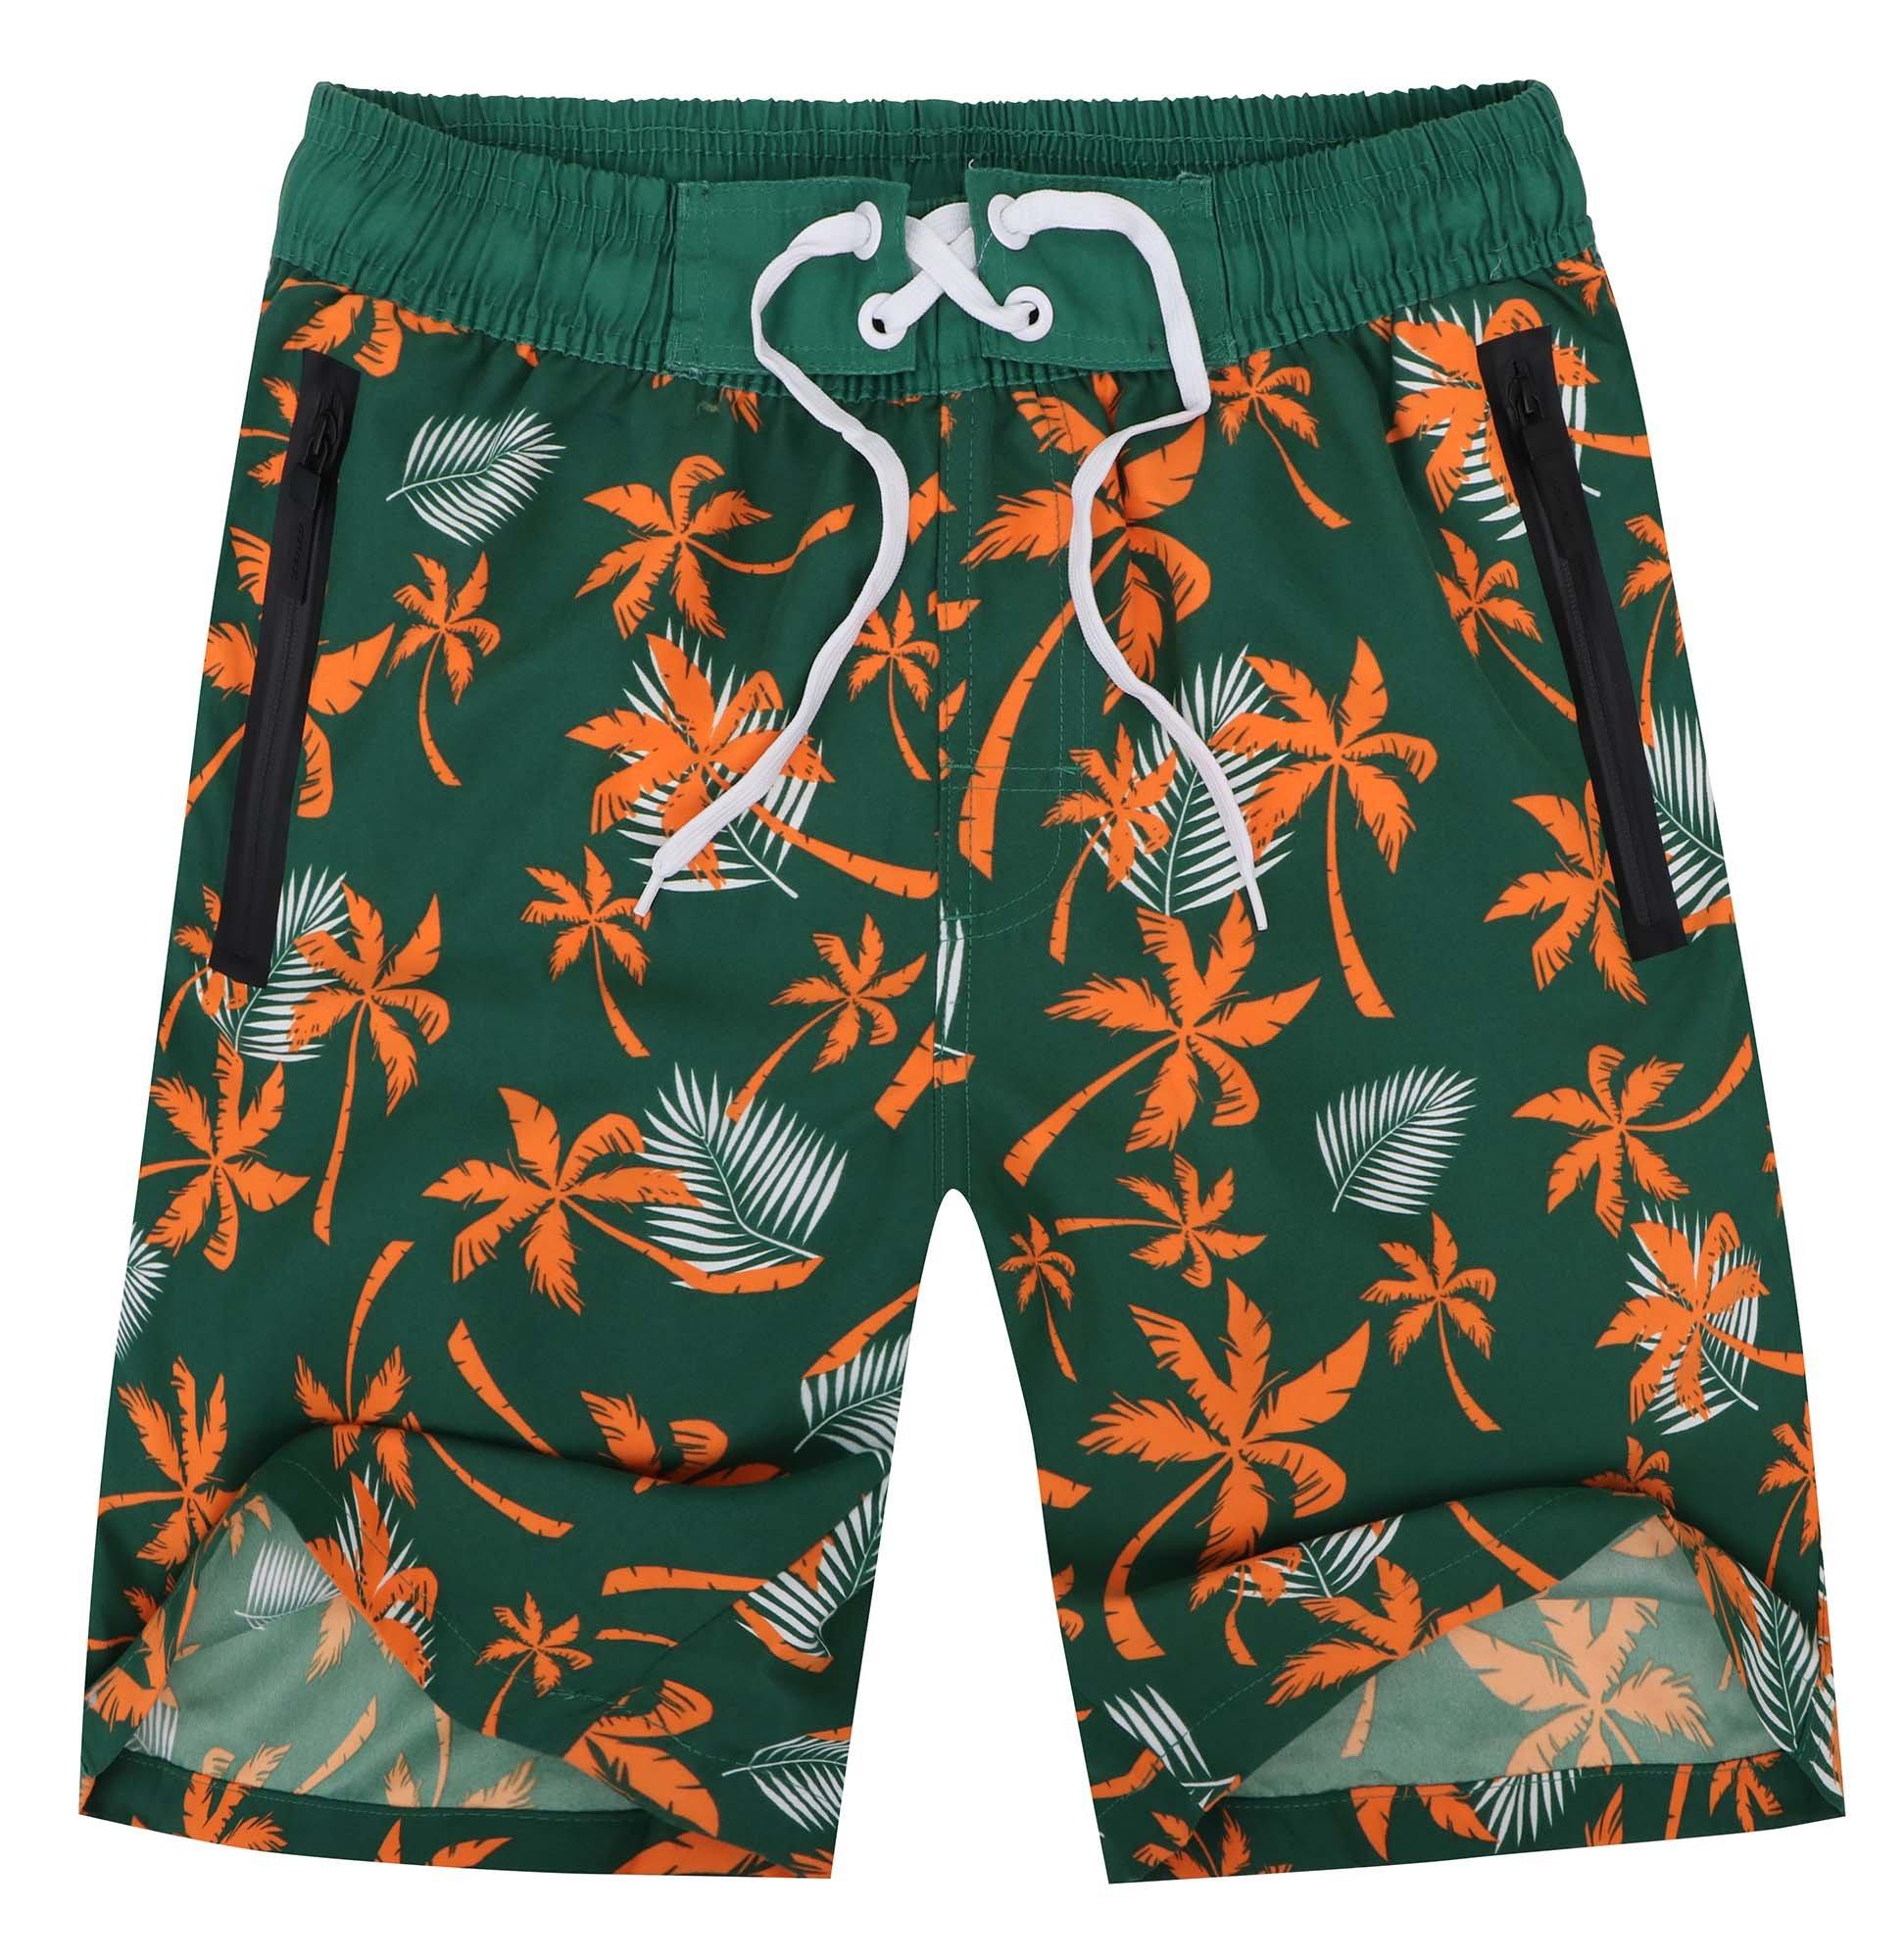 Halconia Men's Quick Dry Swim Trunks Beach Shorts w/Mesh Lining, Mark_Green, M